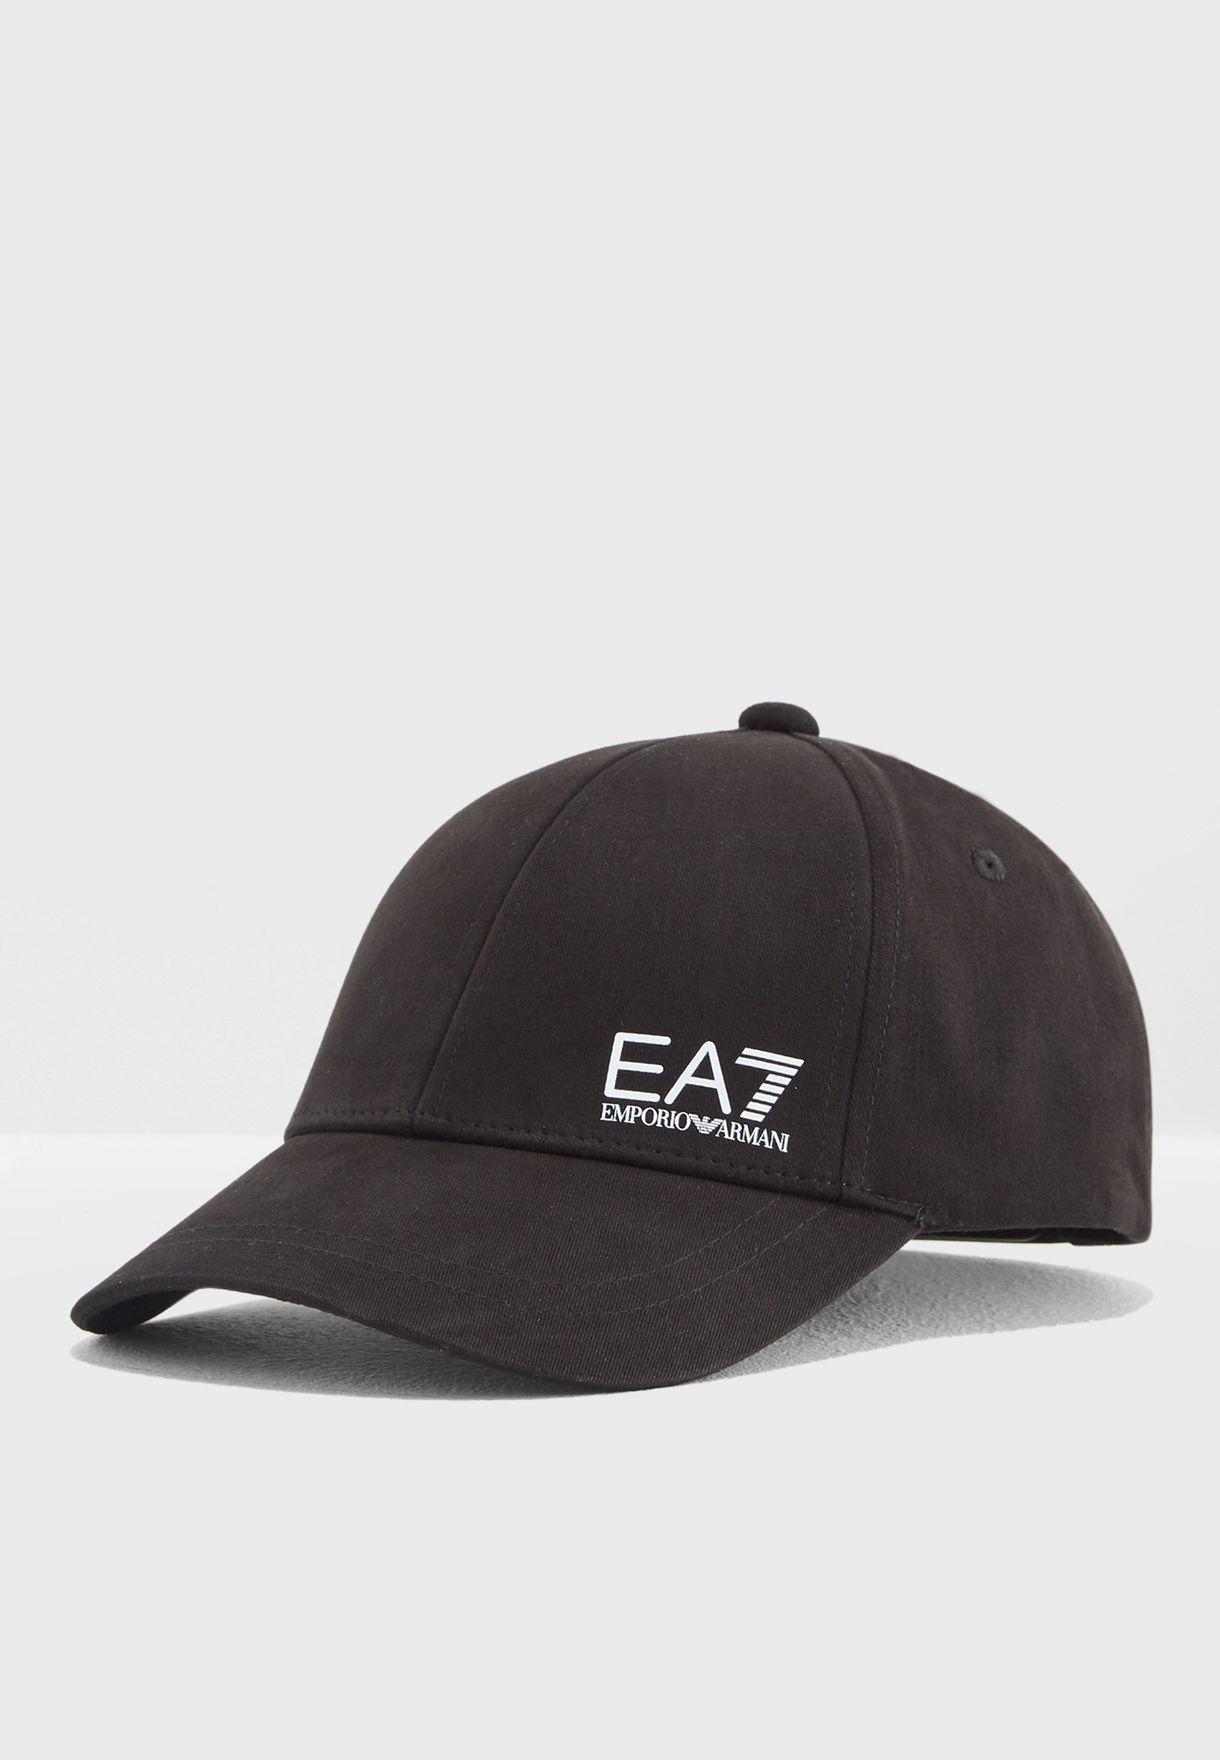 93724a31d3bf7 Shop Ea7 Emporio Armani black Logo Hat 8A816-275692-121 for Men in ...